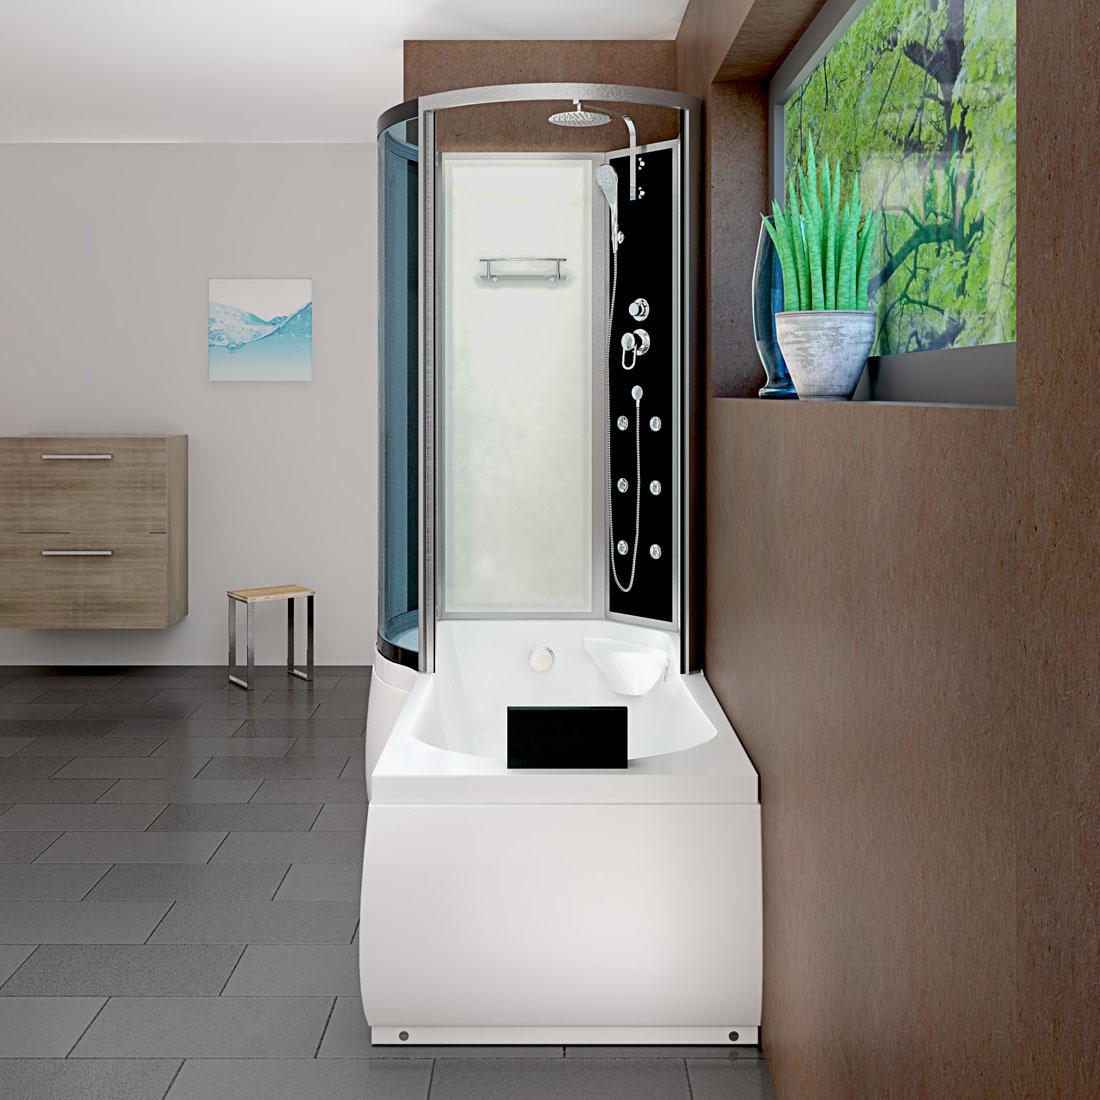 acquavapore dtp8050 a000r dusch wannen kombi in 98x170cm trendbad24. Black Bedroom Furniture Sets. Home Design Ideas